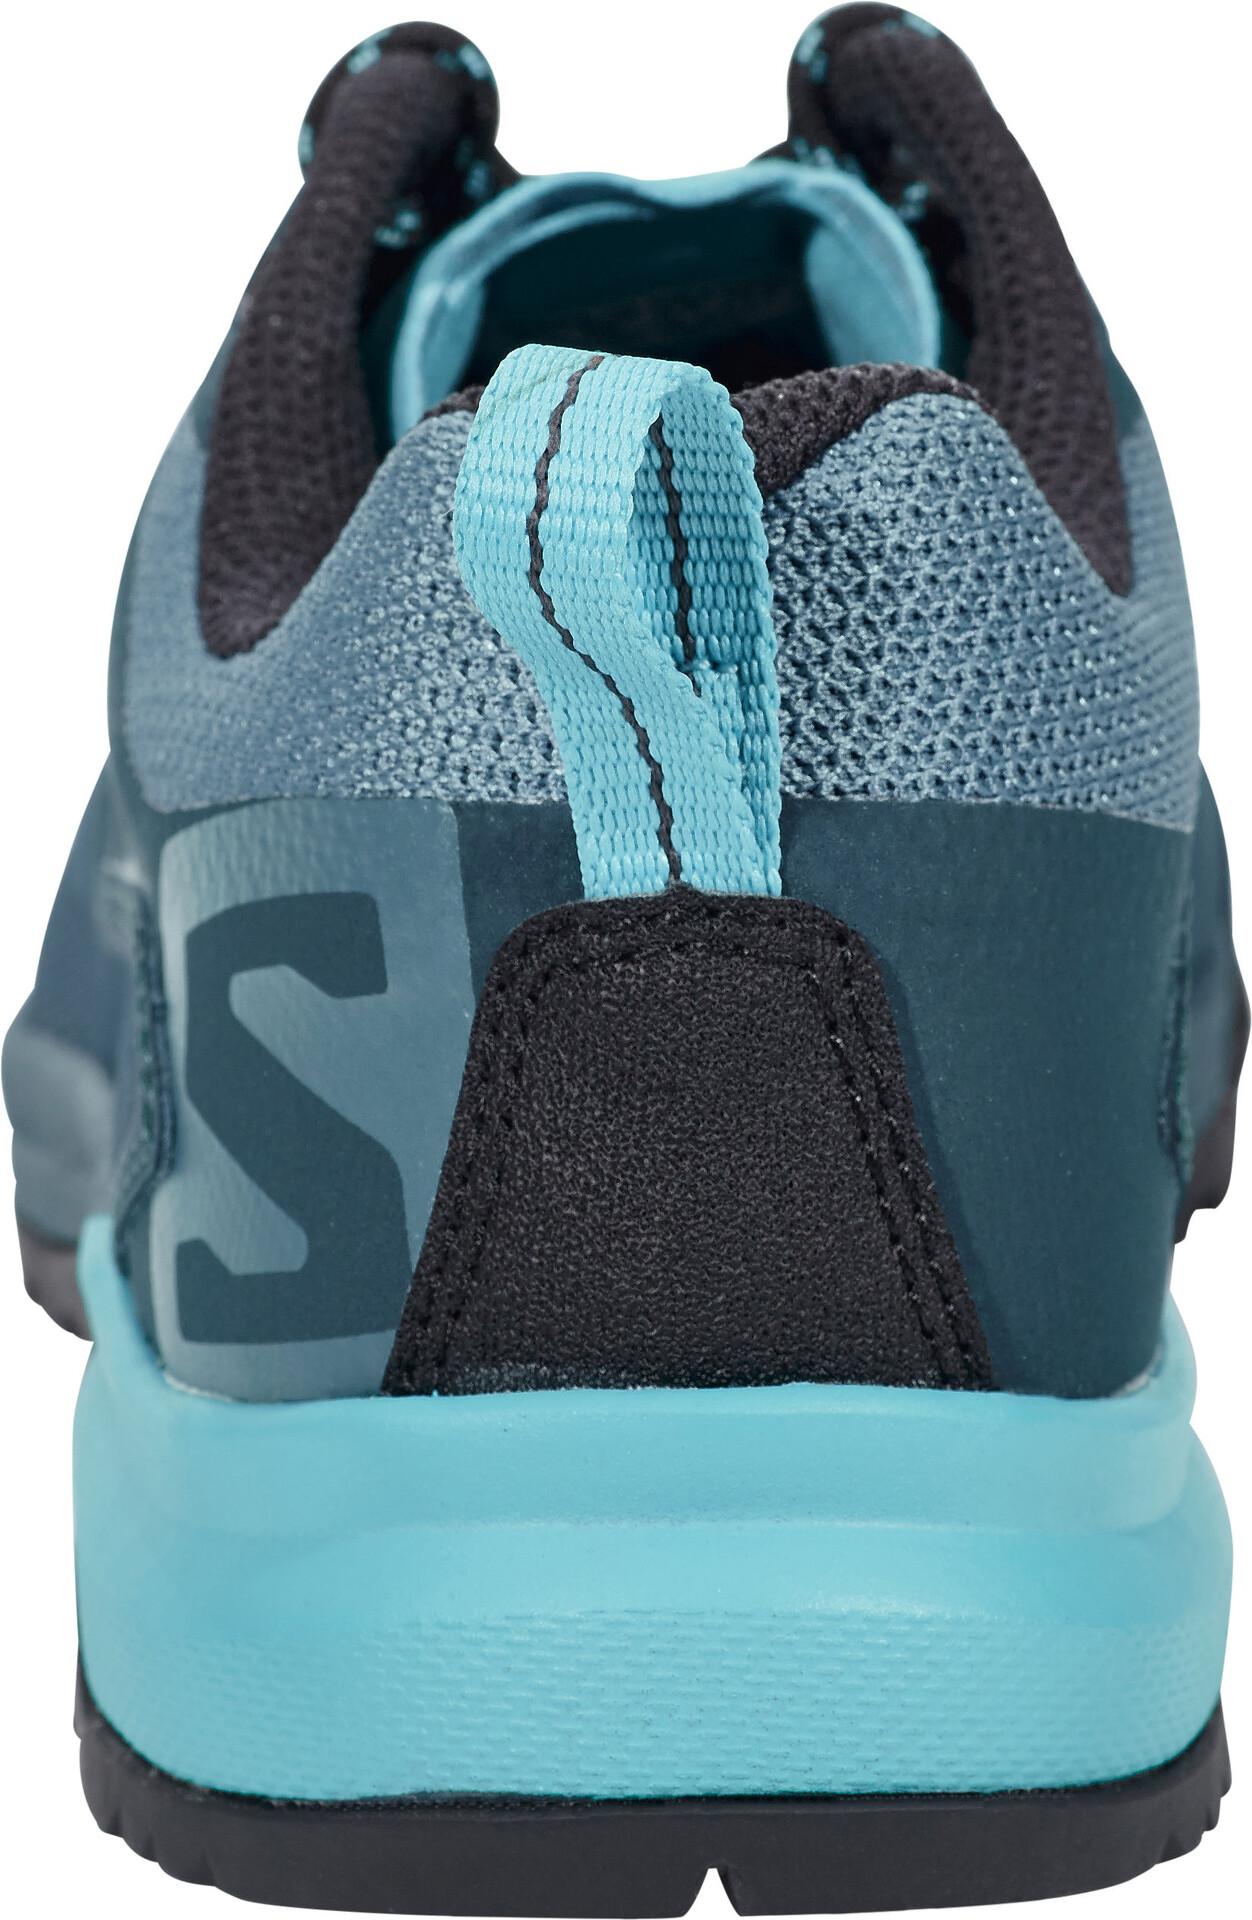 Salomon X Alp Spry Chaussures de randonnée Femme, mallard bluereflecting pondblue bird